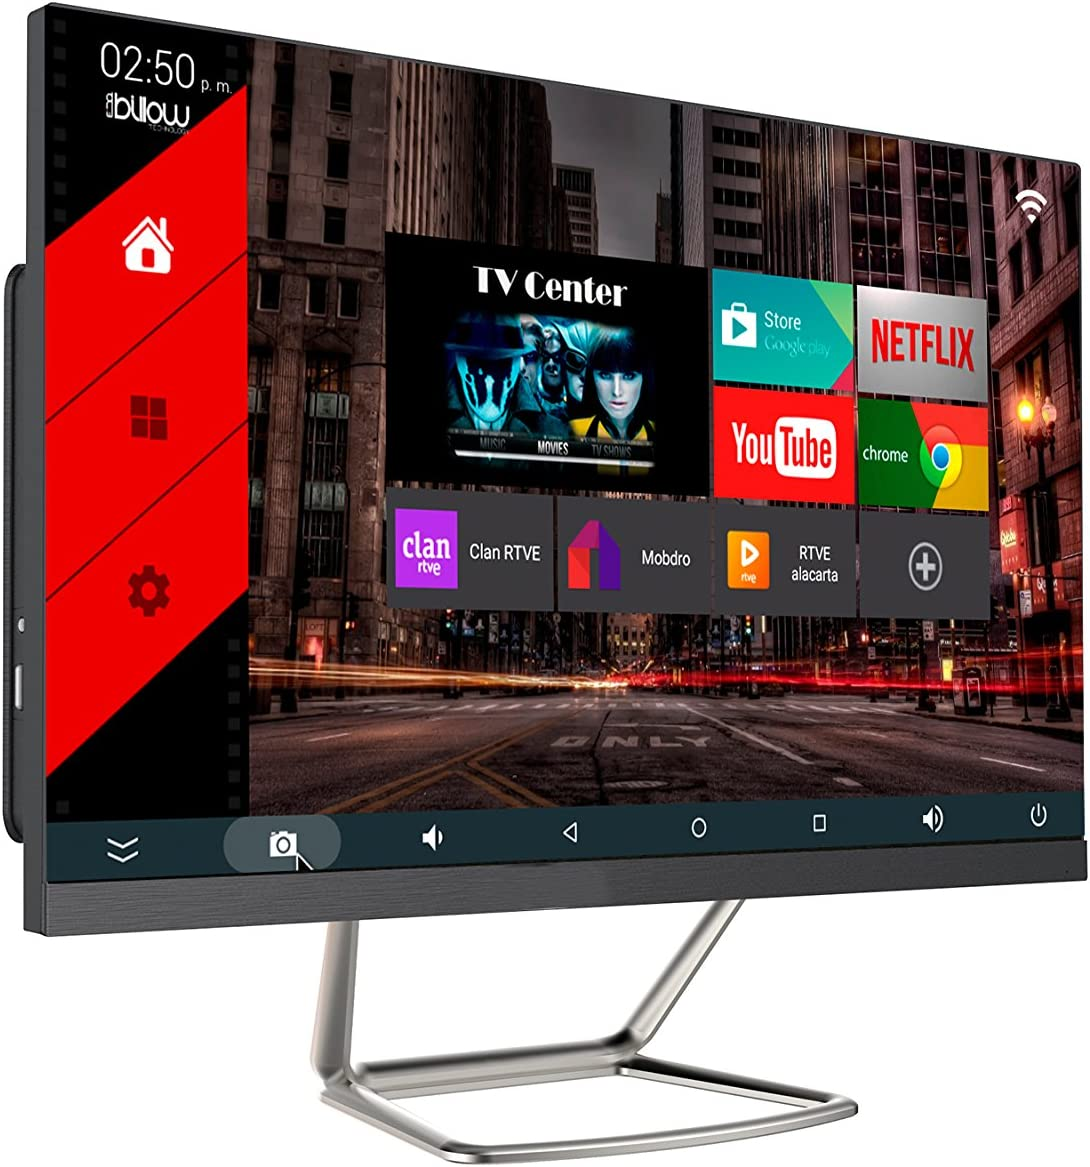 Billow Technology MD09TV - Caja Multimedia Android para televisión (4K, procesador Octa Core a 1.5 GHz, Memoria DDR de 2 GB), Color Negro: Billow: Amazon.es: Electrónica